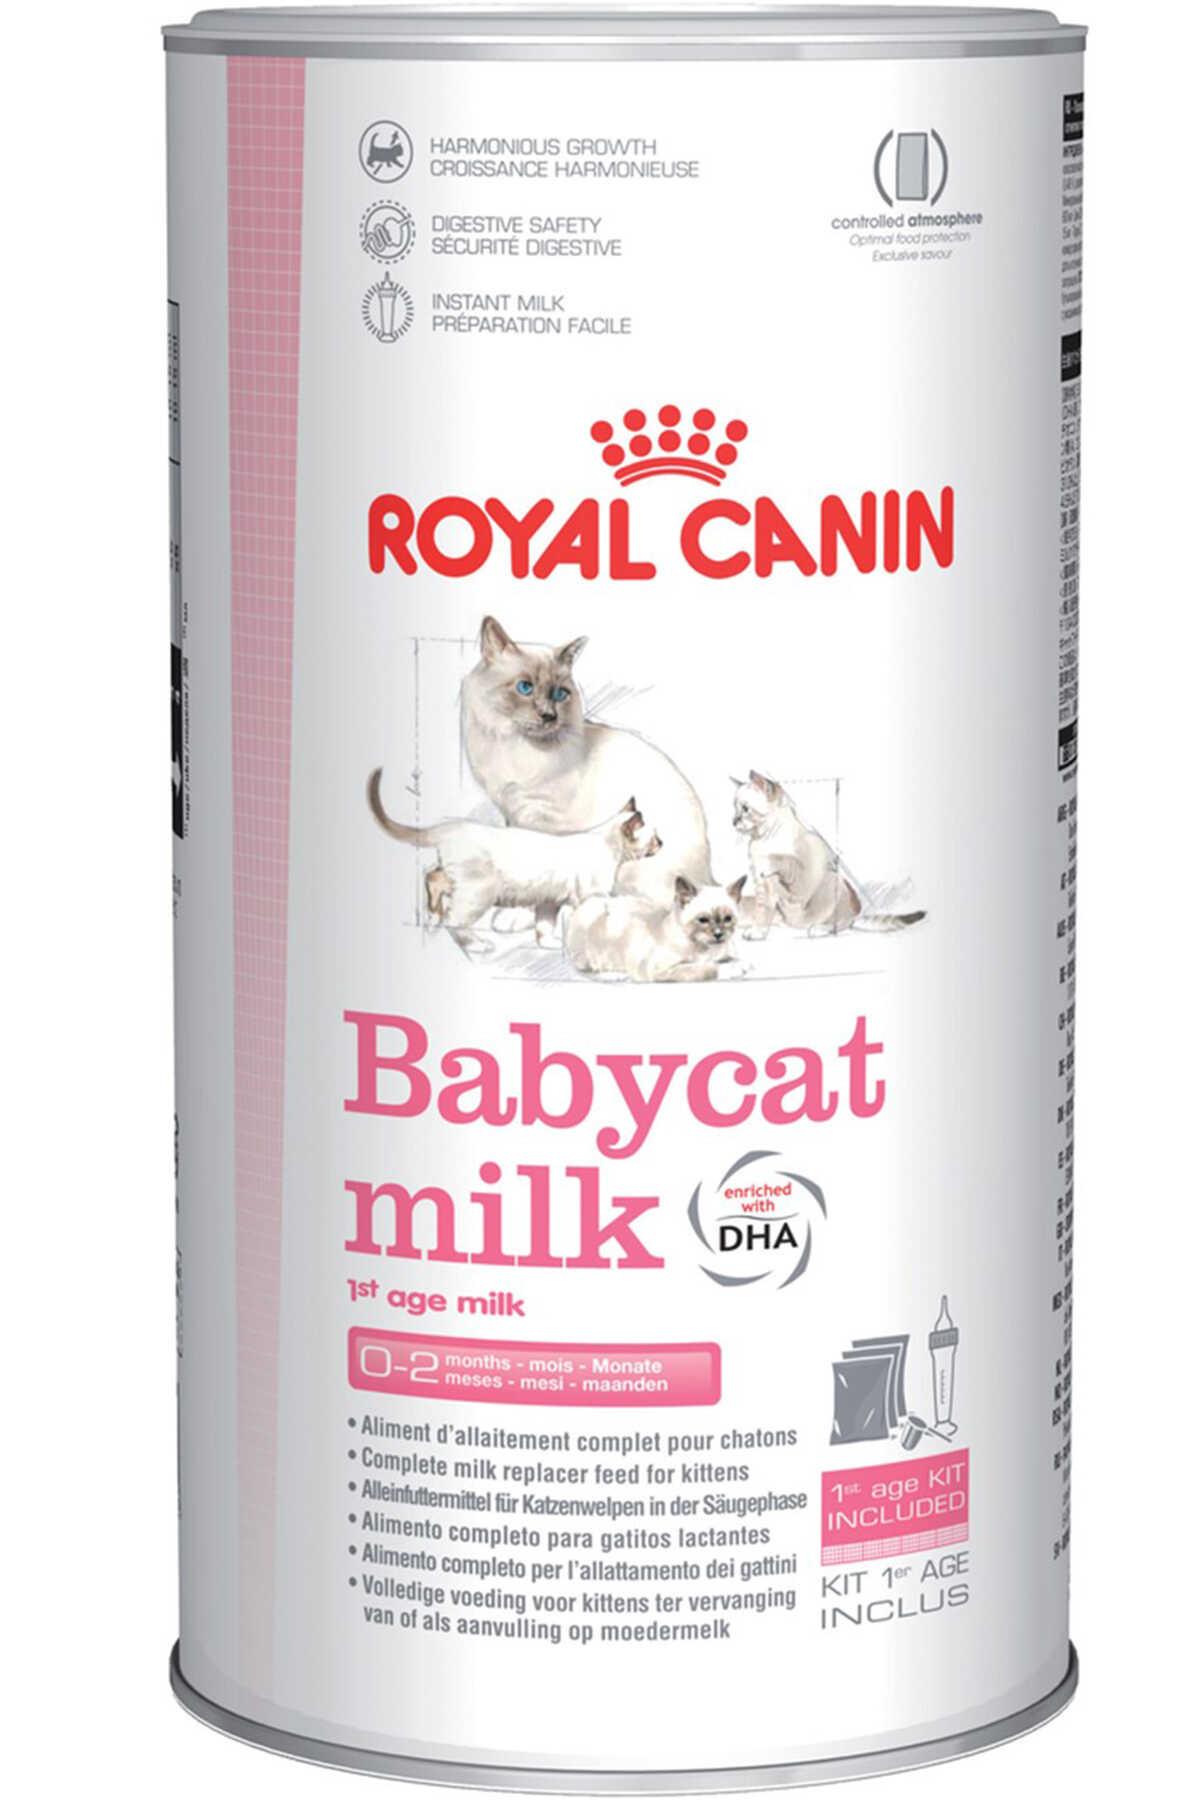 Royal Canin Babycat Milk Yavru Kedi Süt Tozu 300gr